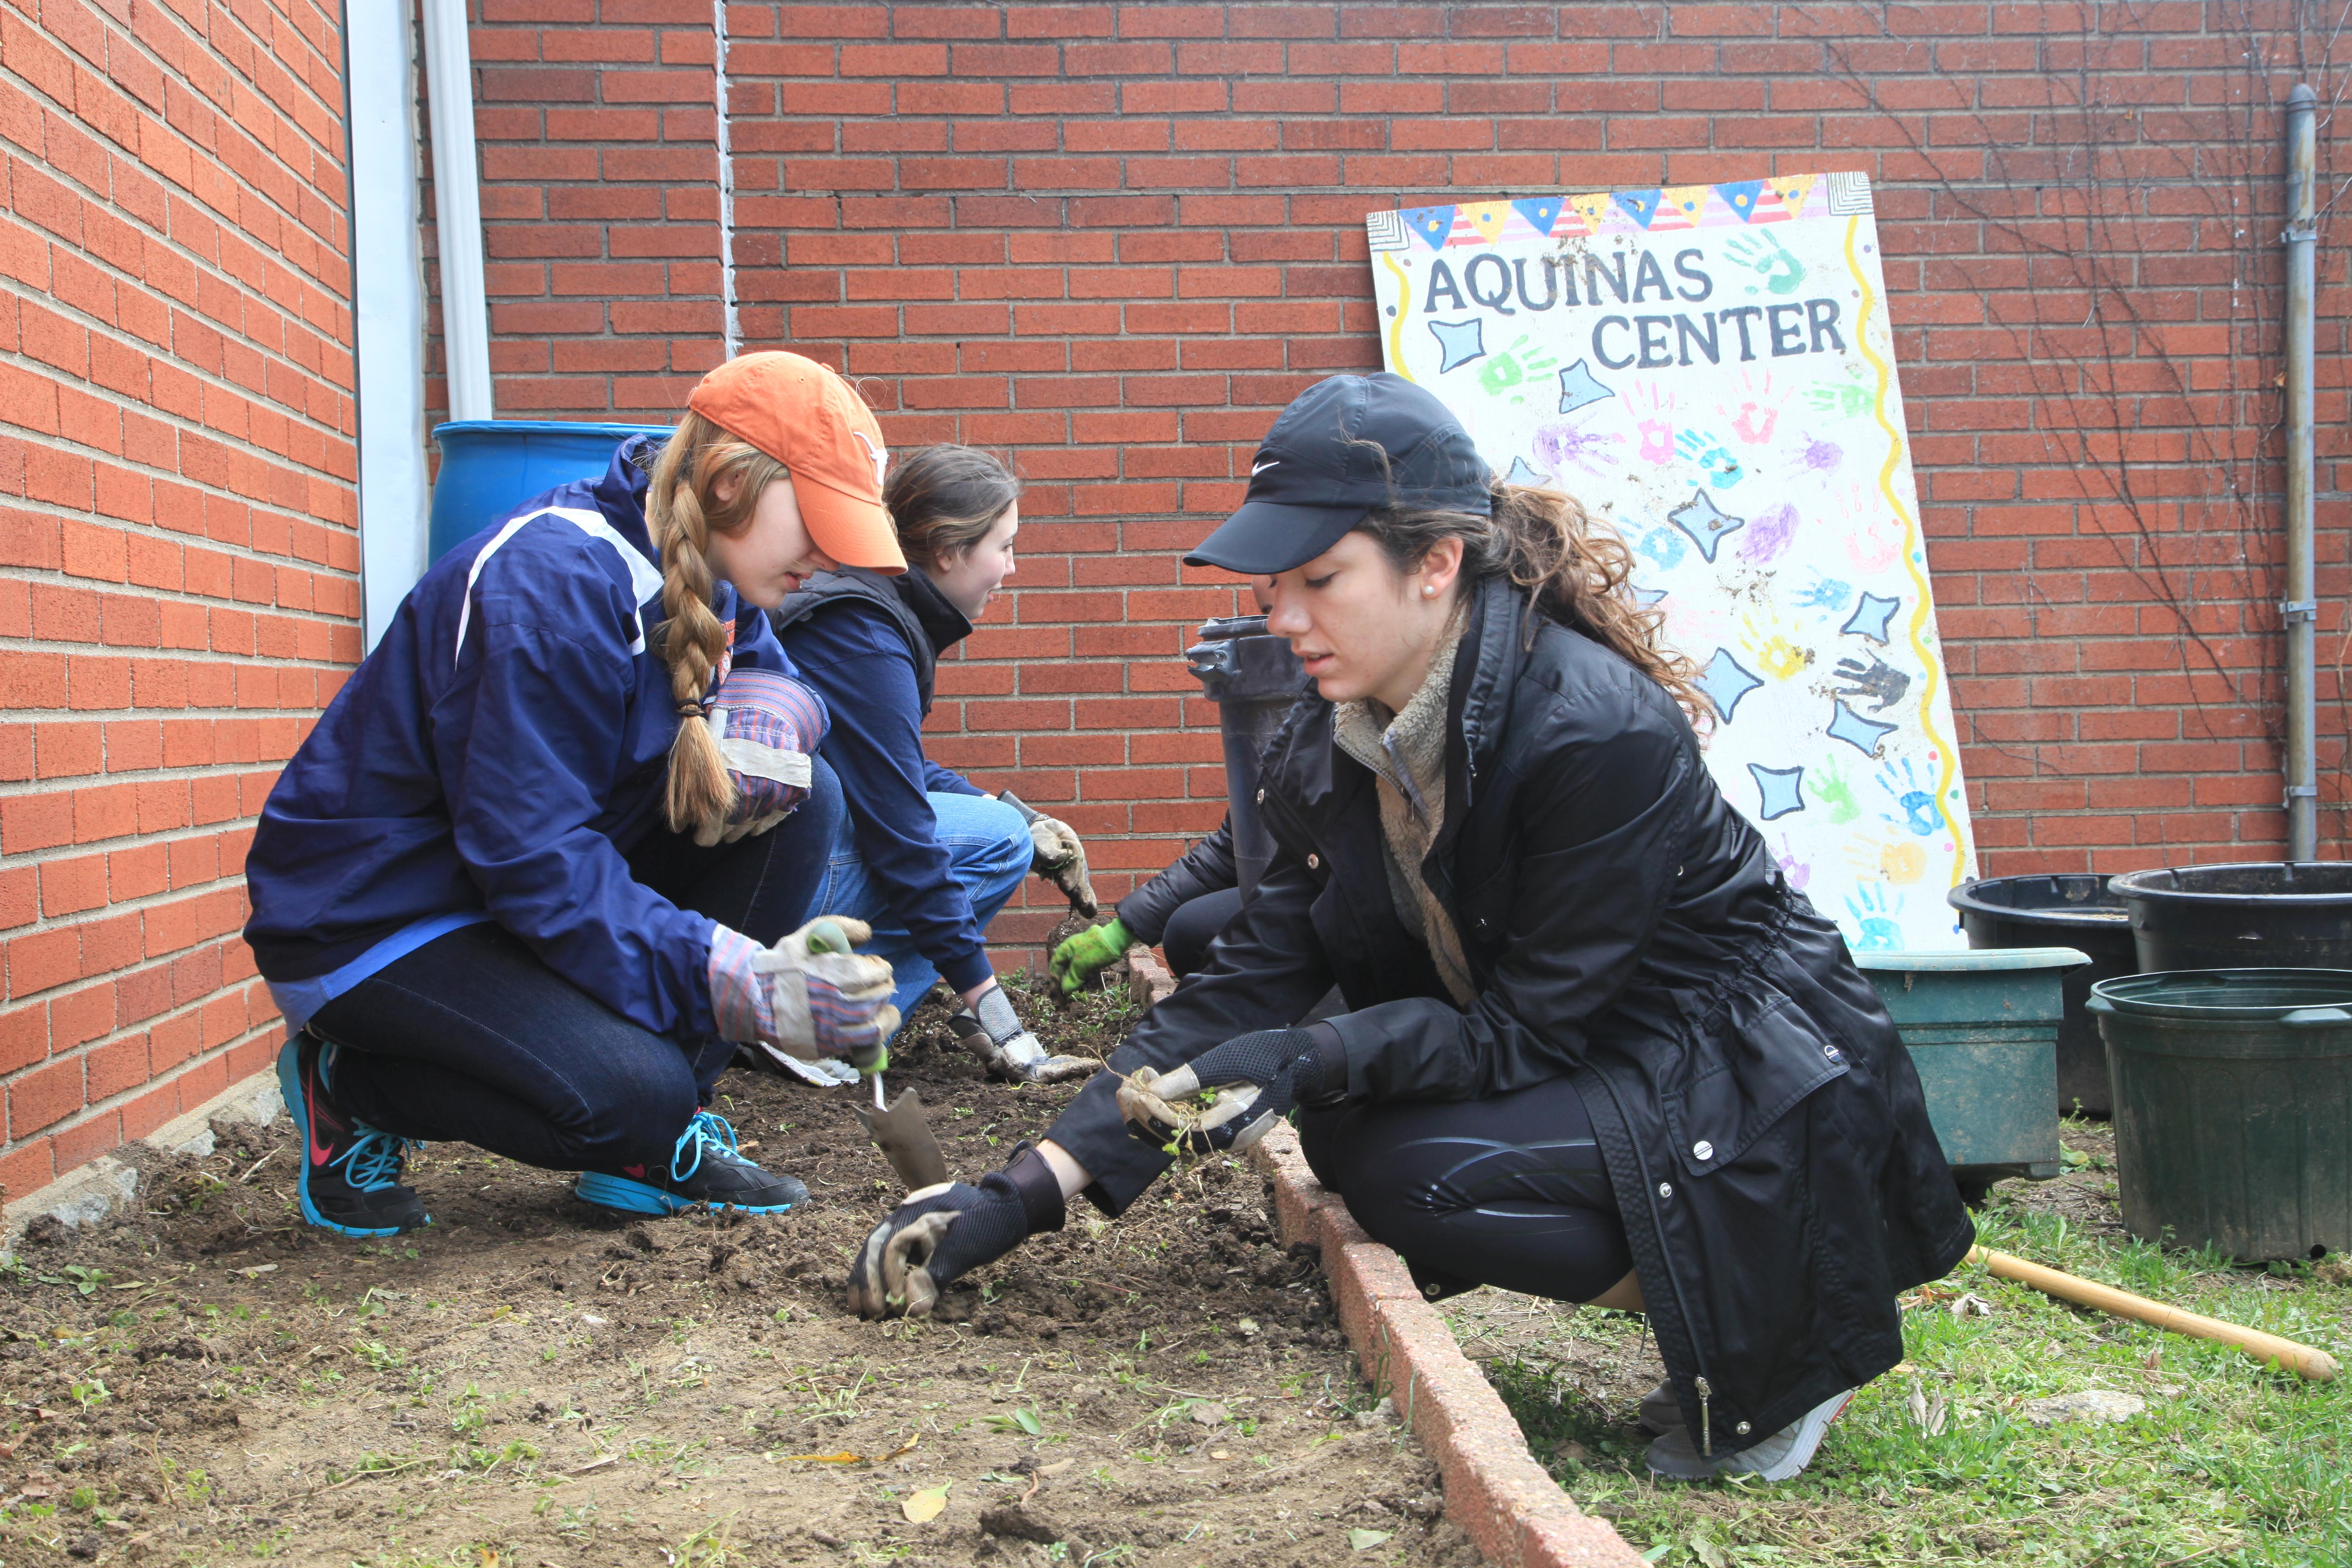 Volunteer gardeners spruce up the Aquinas Center court yard.